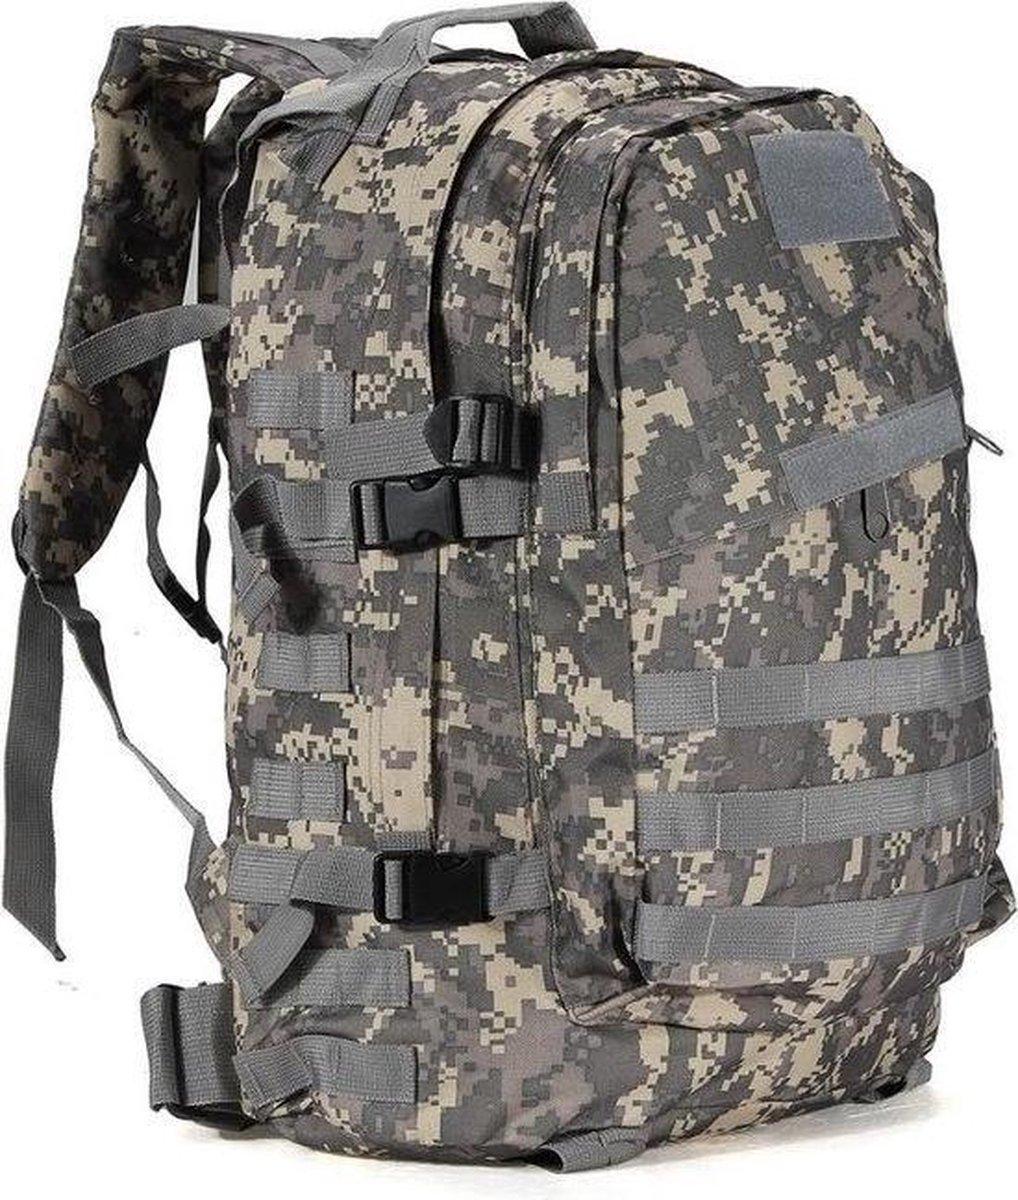 Backpack - Militair Tactisch - Techno Camouflage - Wandelrugzak - 55 Liter